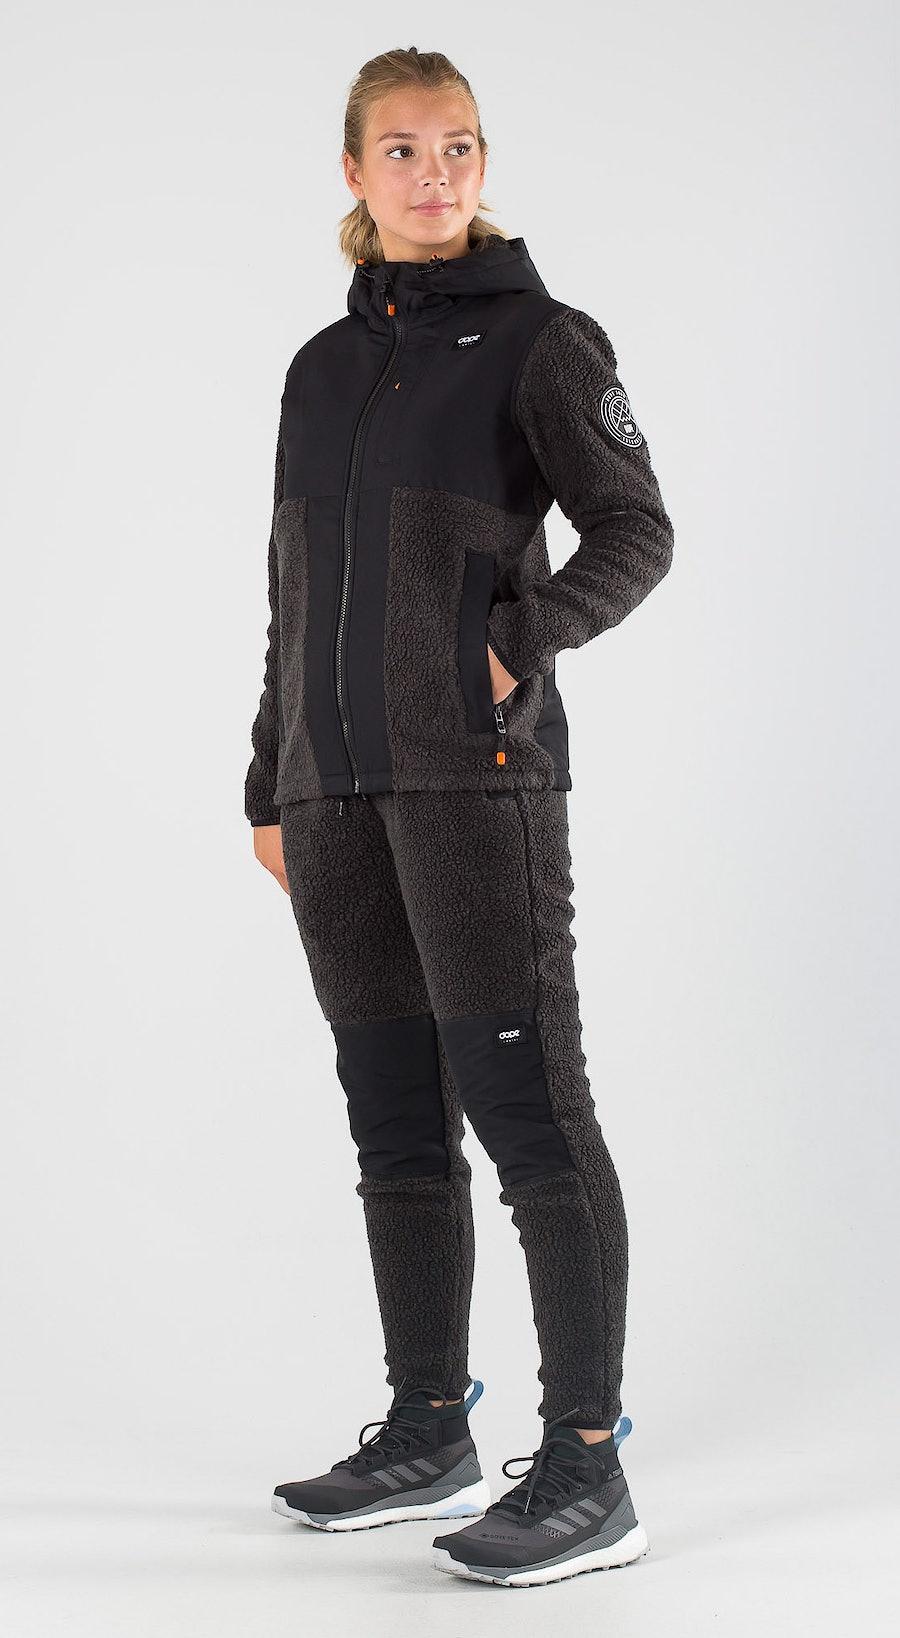 Dope Ollie W Black/Phantom Outfit Multi